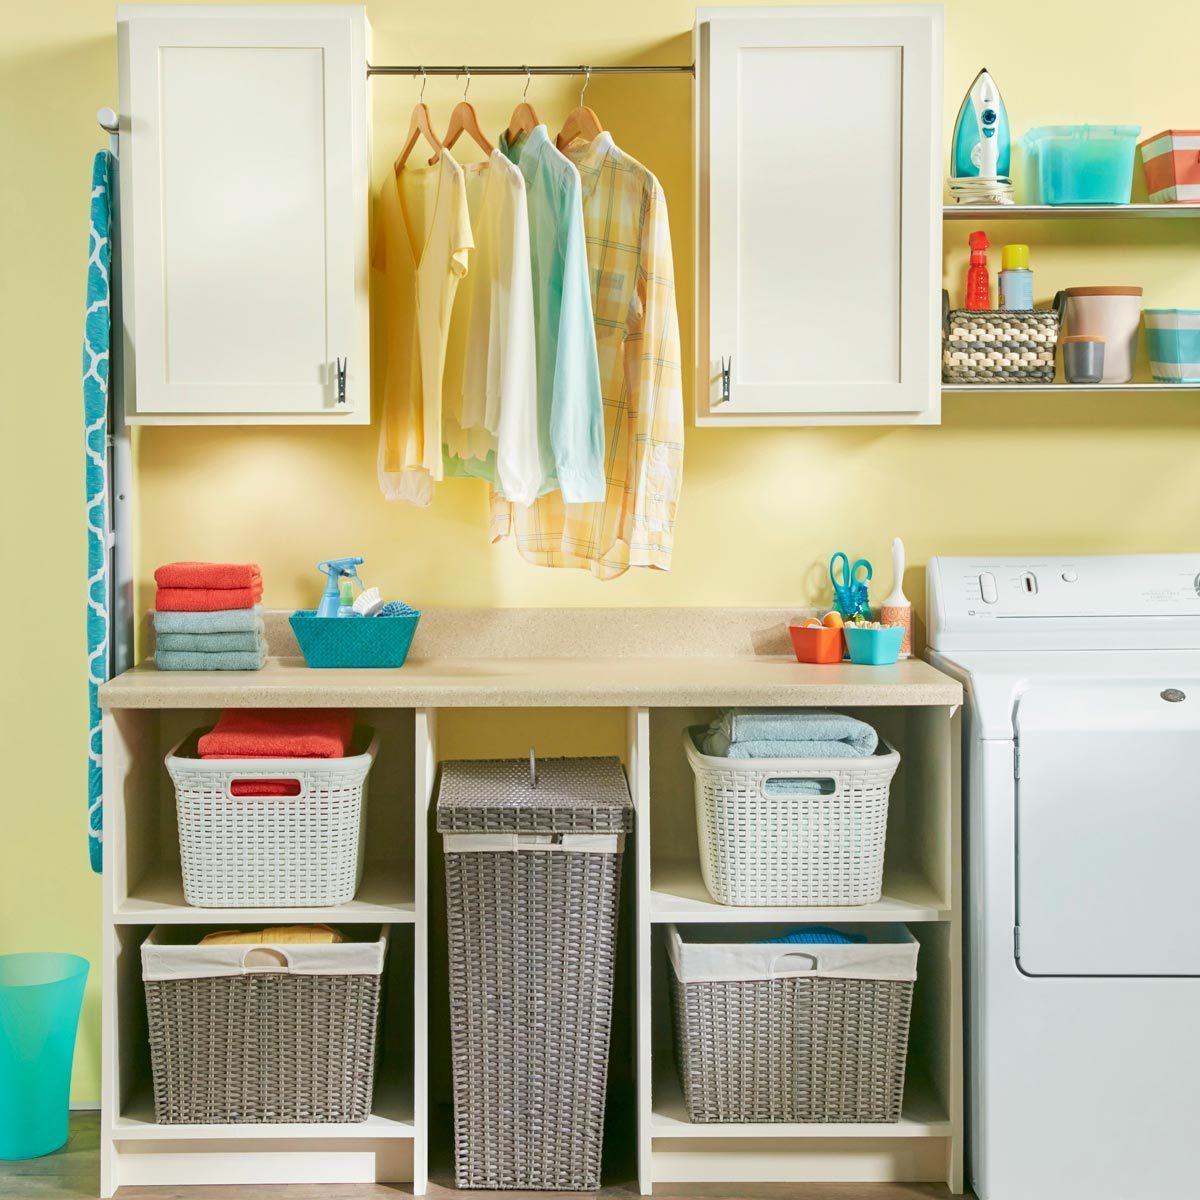 laundry room organizing ideas